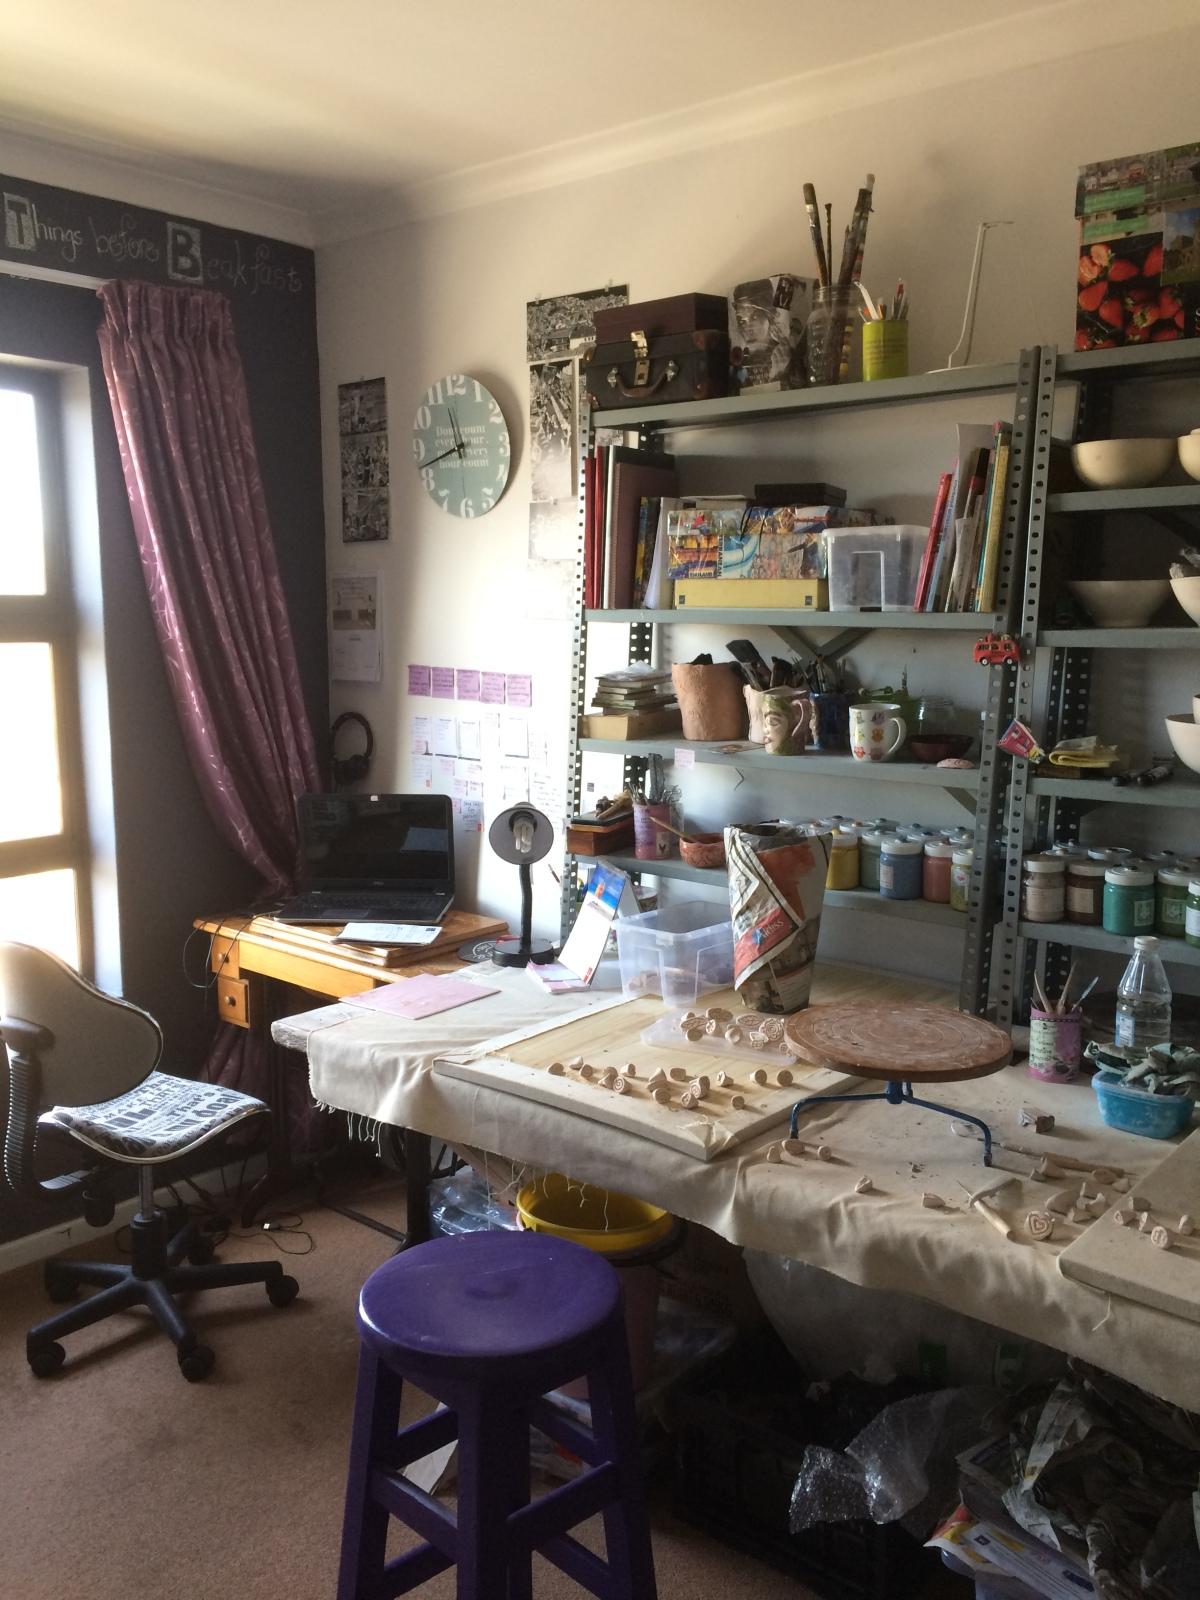 Janaline created an art studio athome